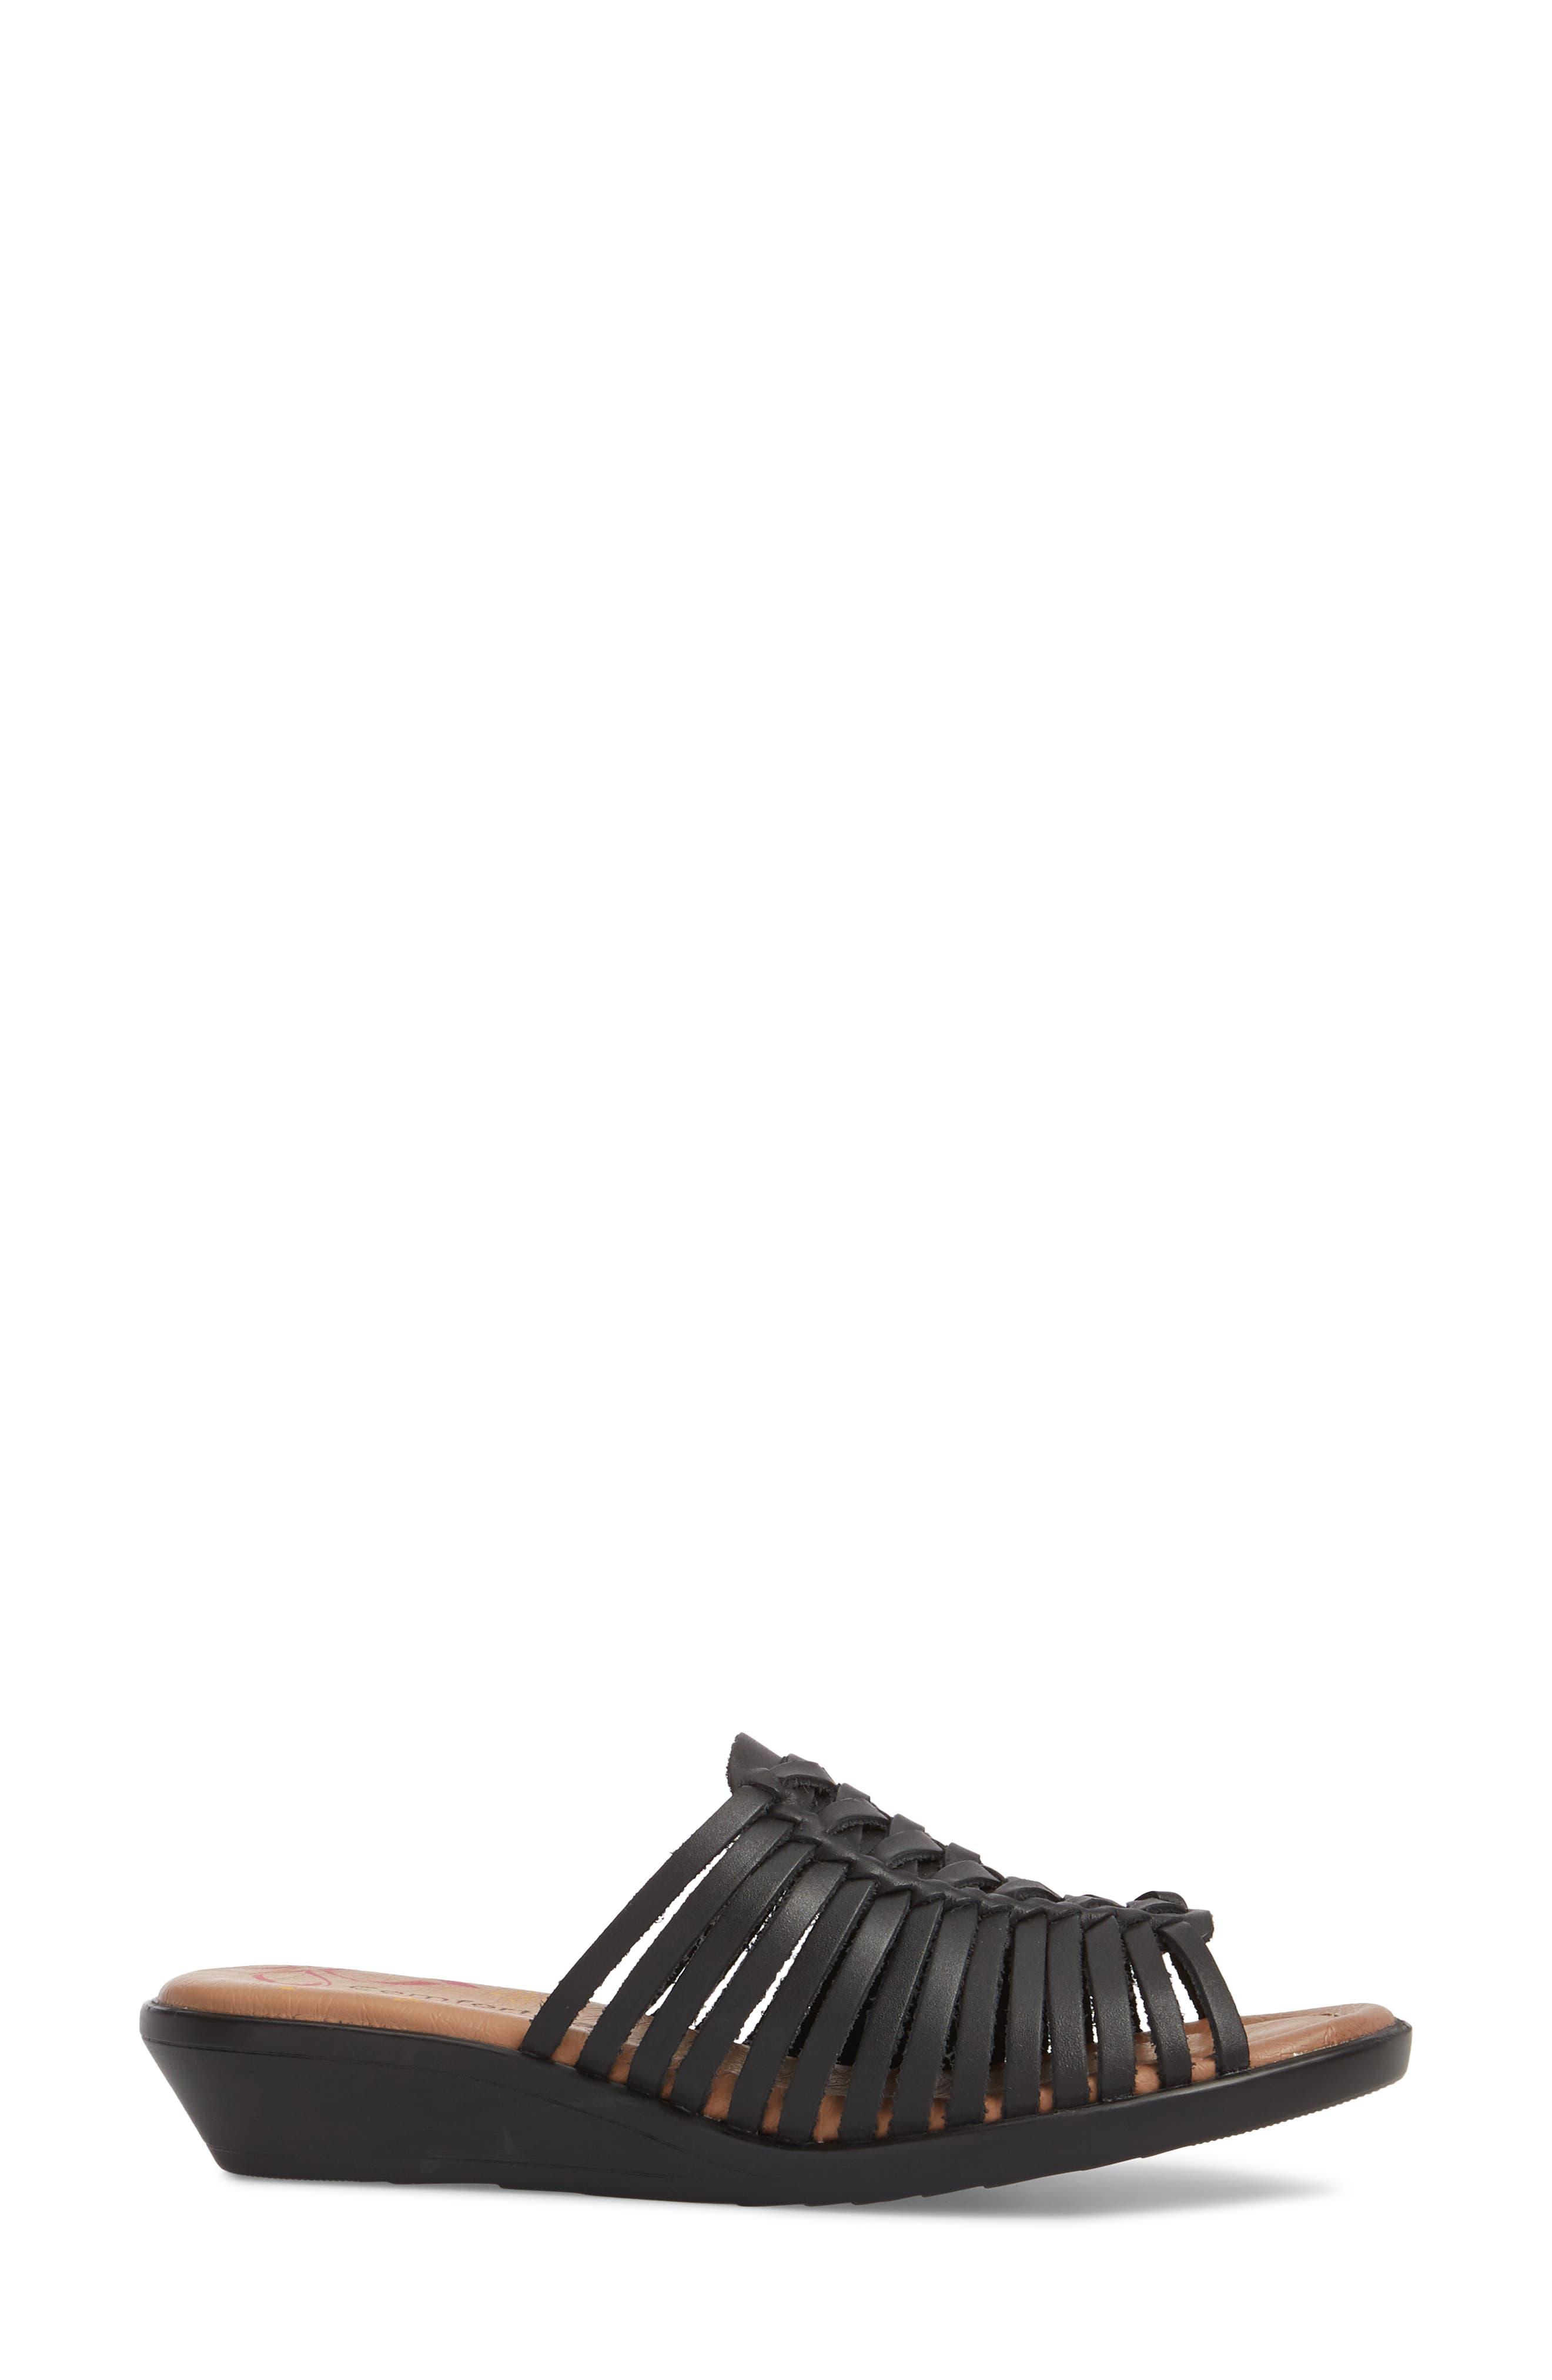 COMFORTIVA, Felida Huarache Slide Sandal, Alternate thumbnail 3, color, BLACK LEATHER